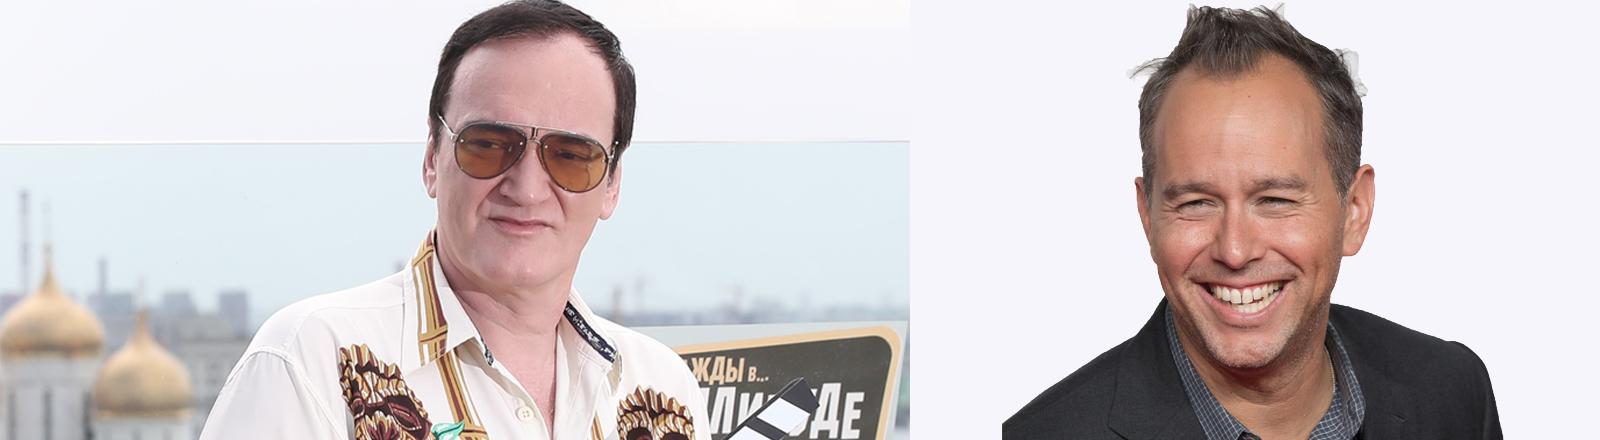 Quentin Tarantino und Jona Rivera